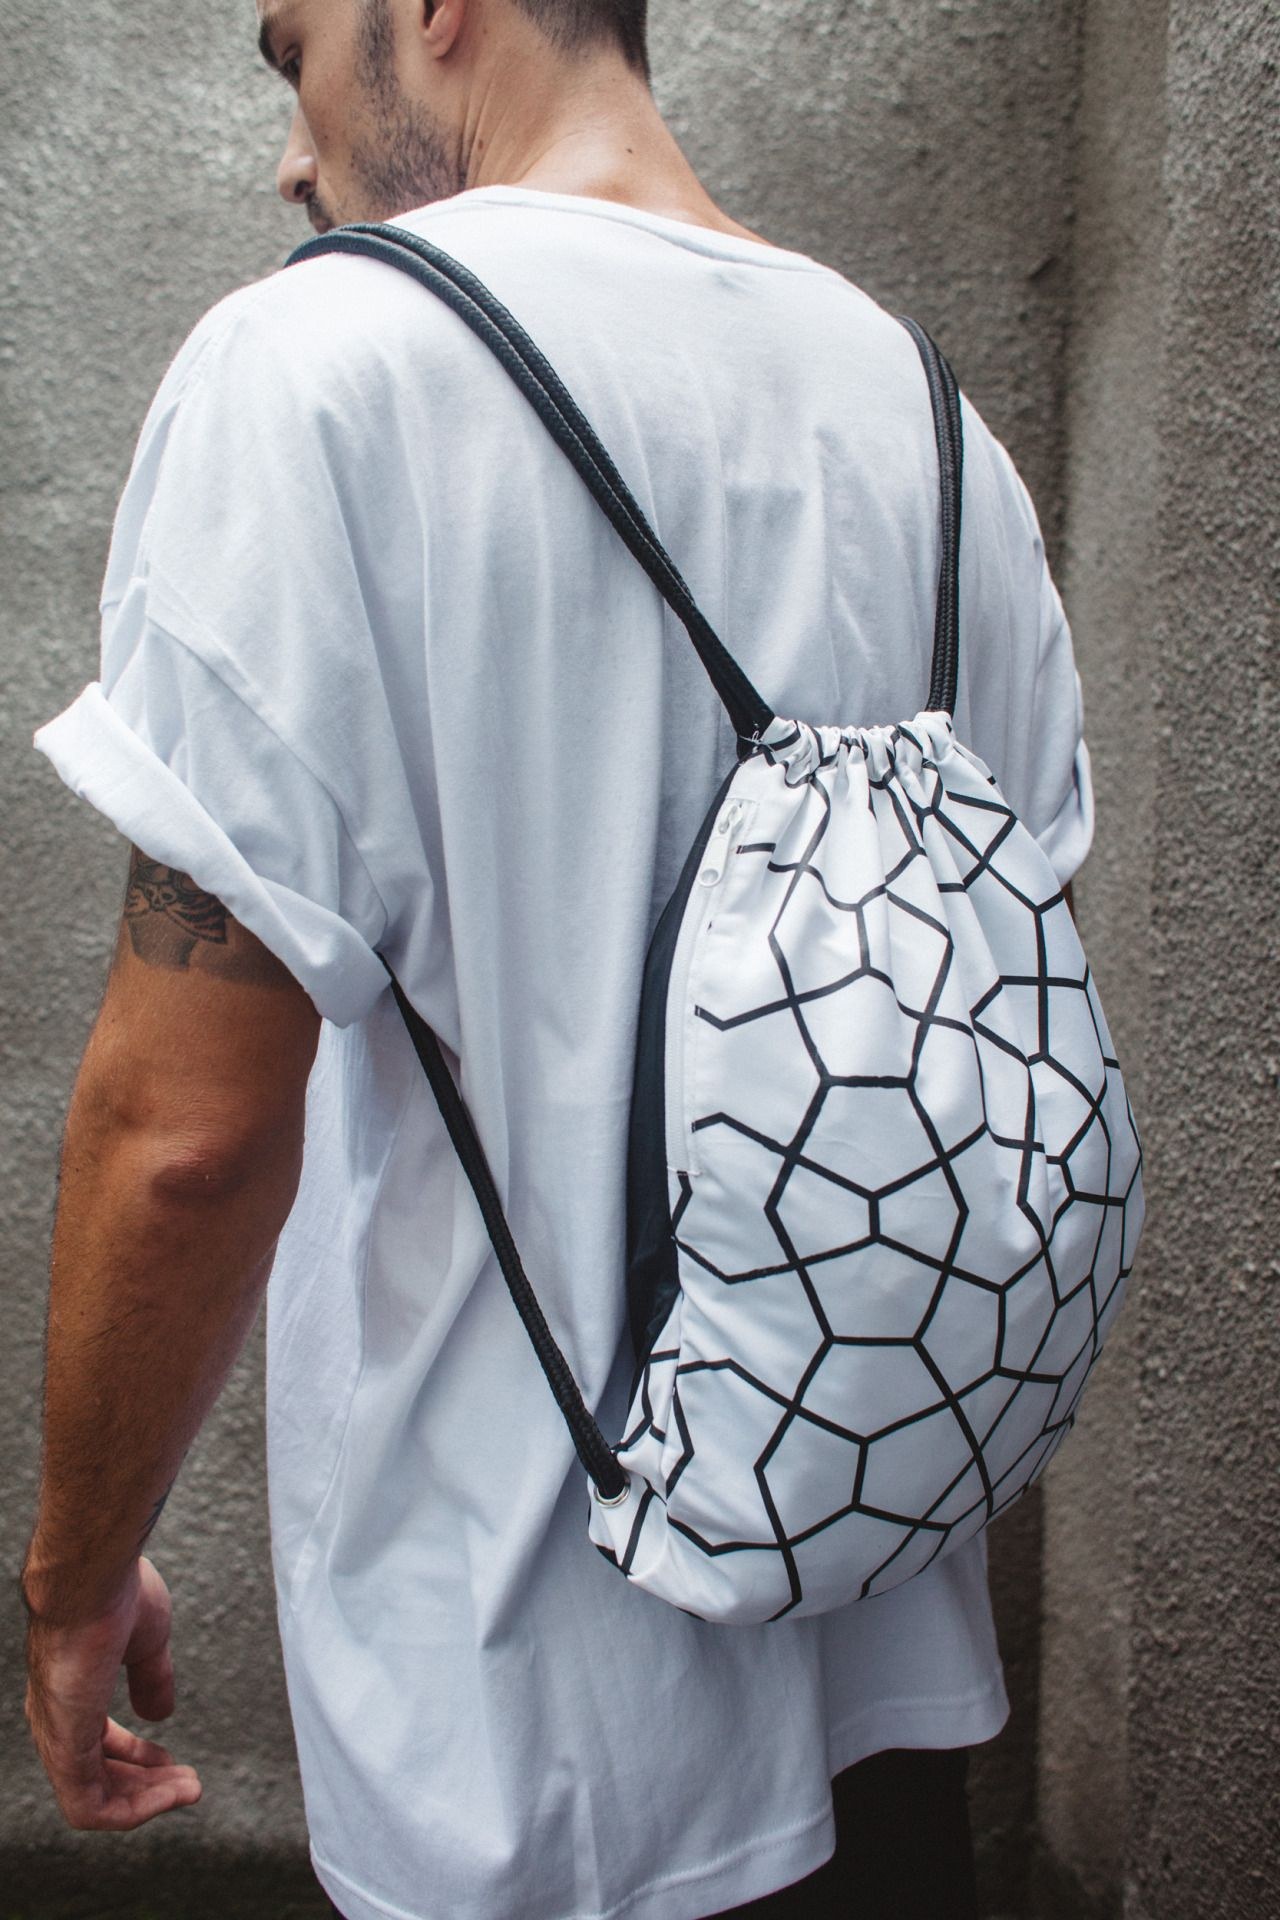 sickstreetwear | Bags, Drawstring bag, Street wear urban